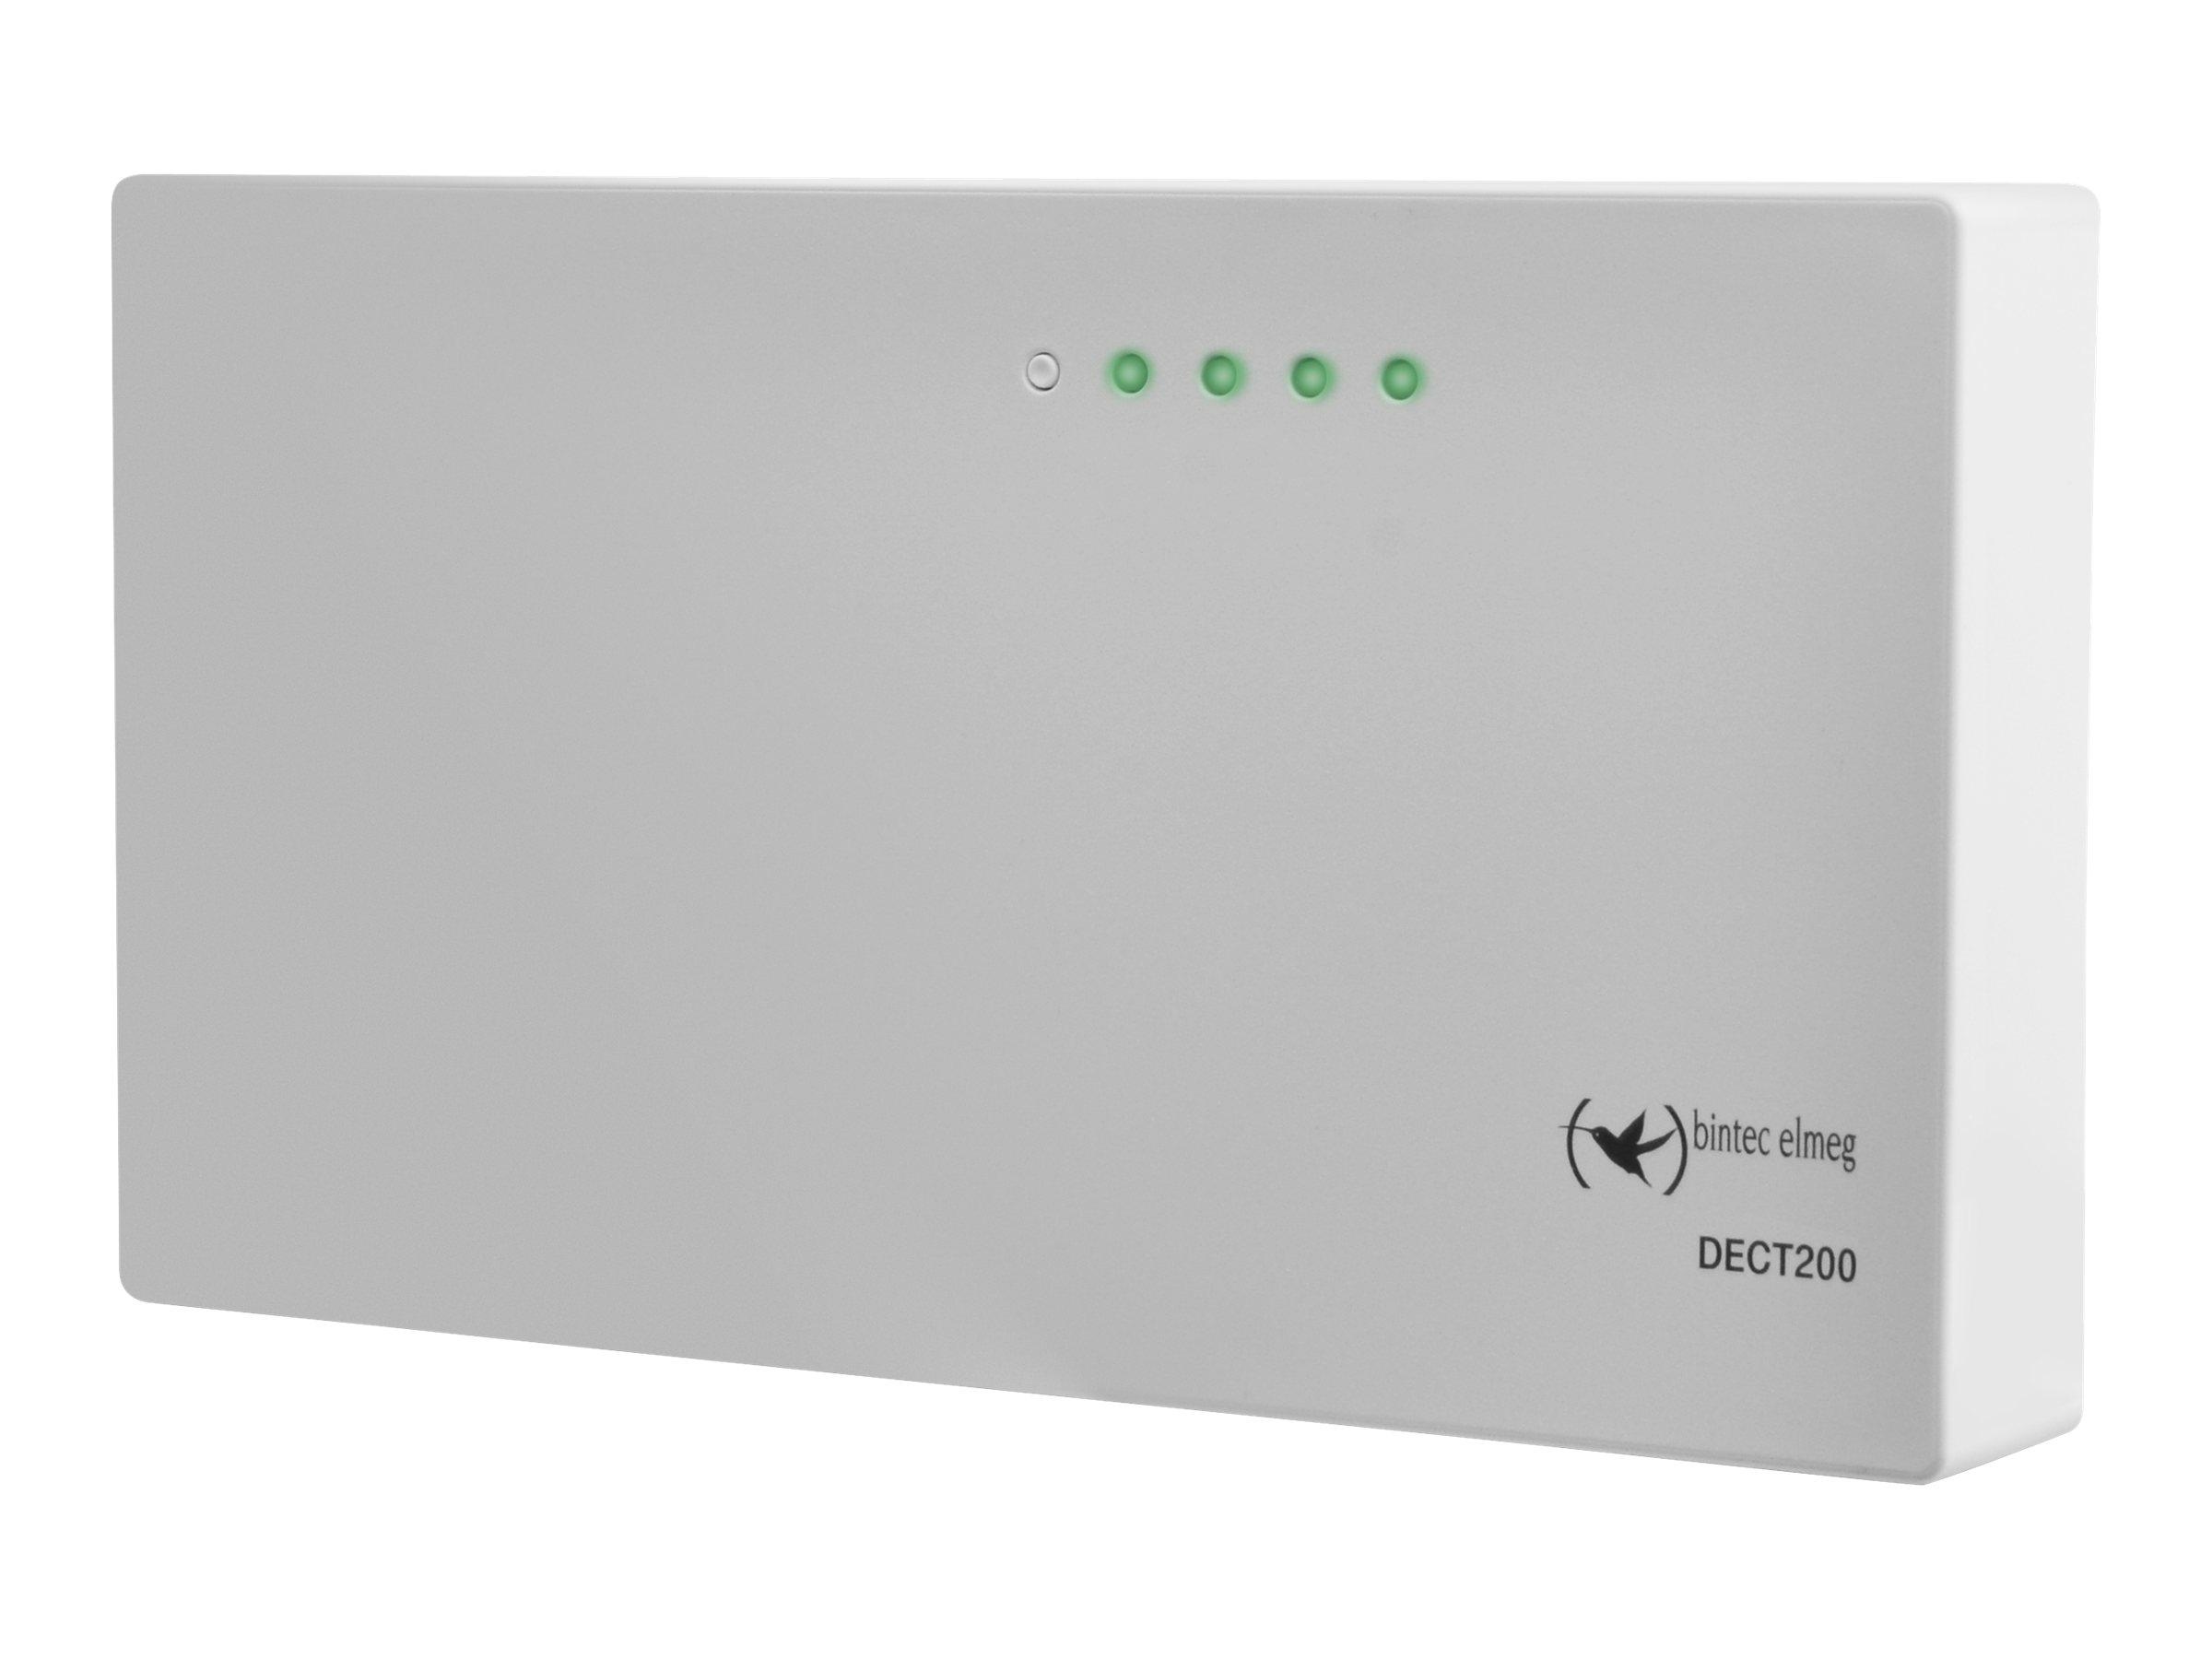 elmeg DECT200 - Basisstation für kabelloses VoIP-Telefon - 100Mb LAN